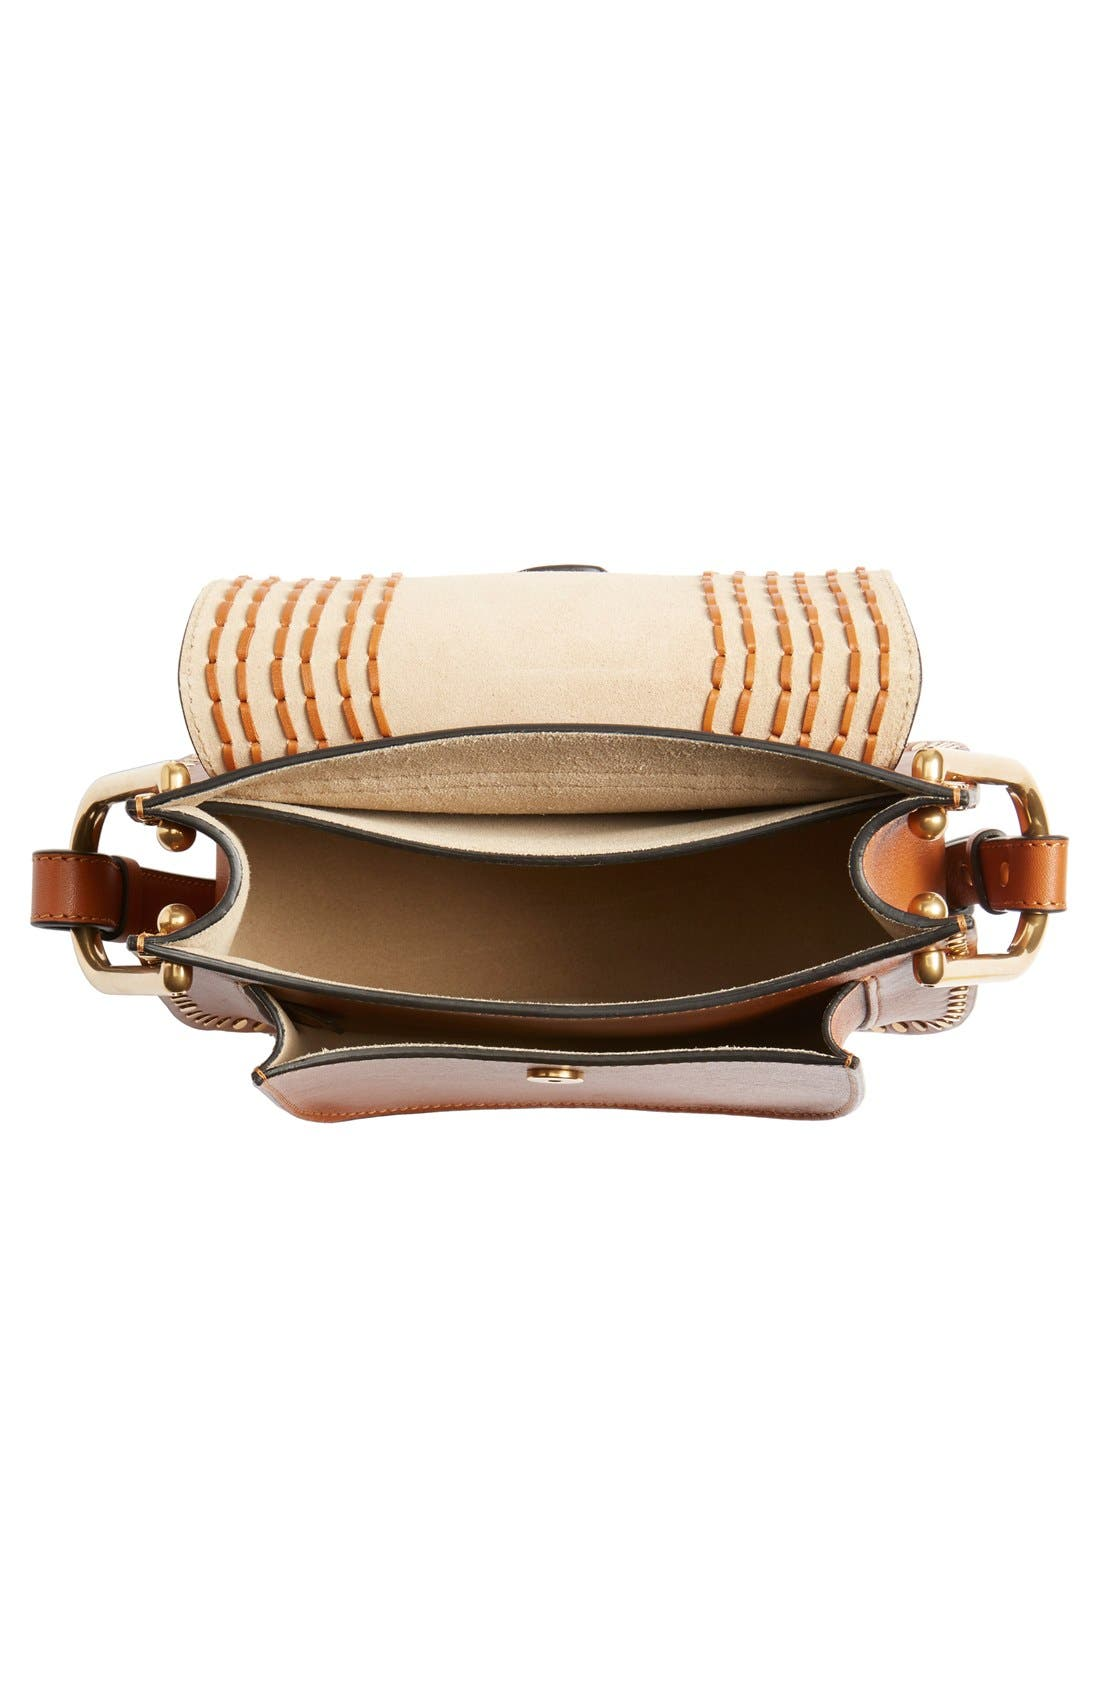 'Small Hudson' Studded Calfskin Leather Crossbody Bag,                             Alternate thumbnail 4, color,                             Caramel